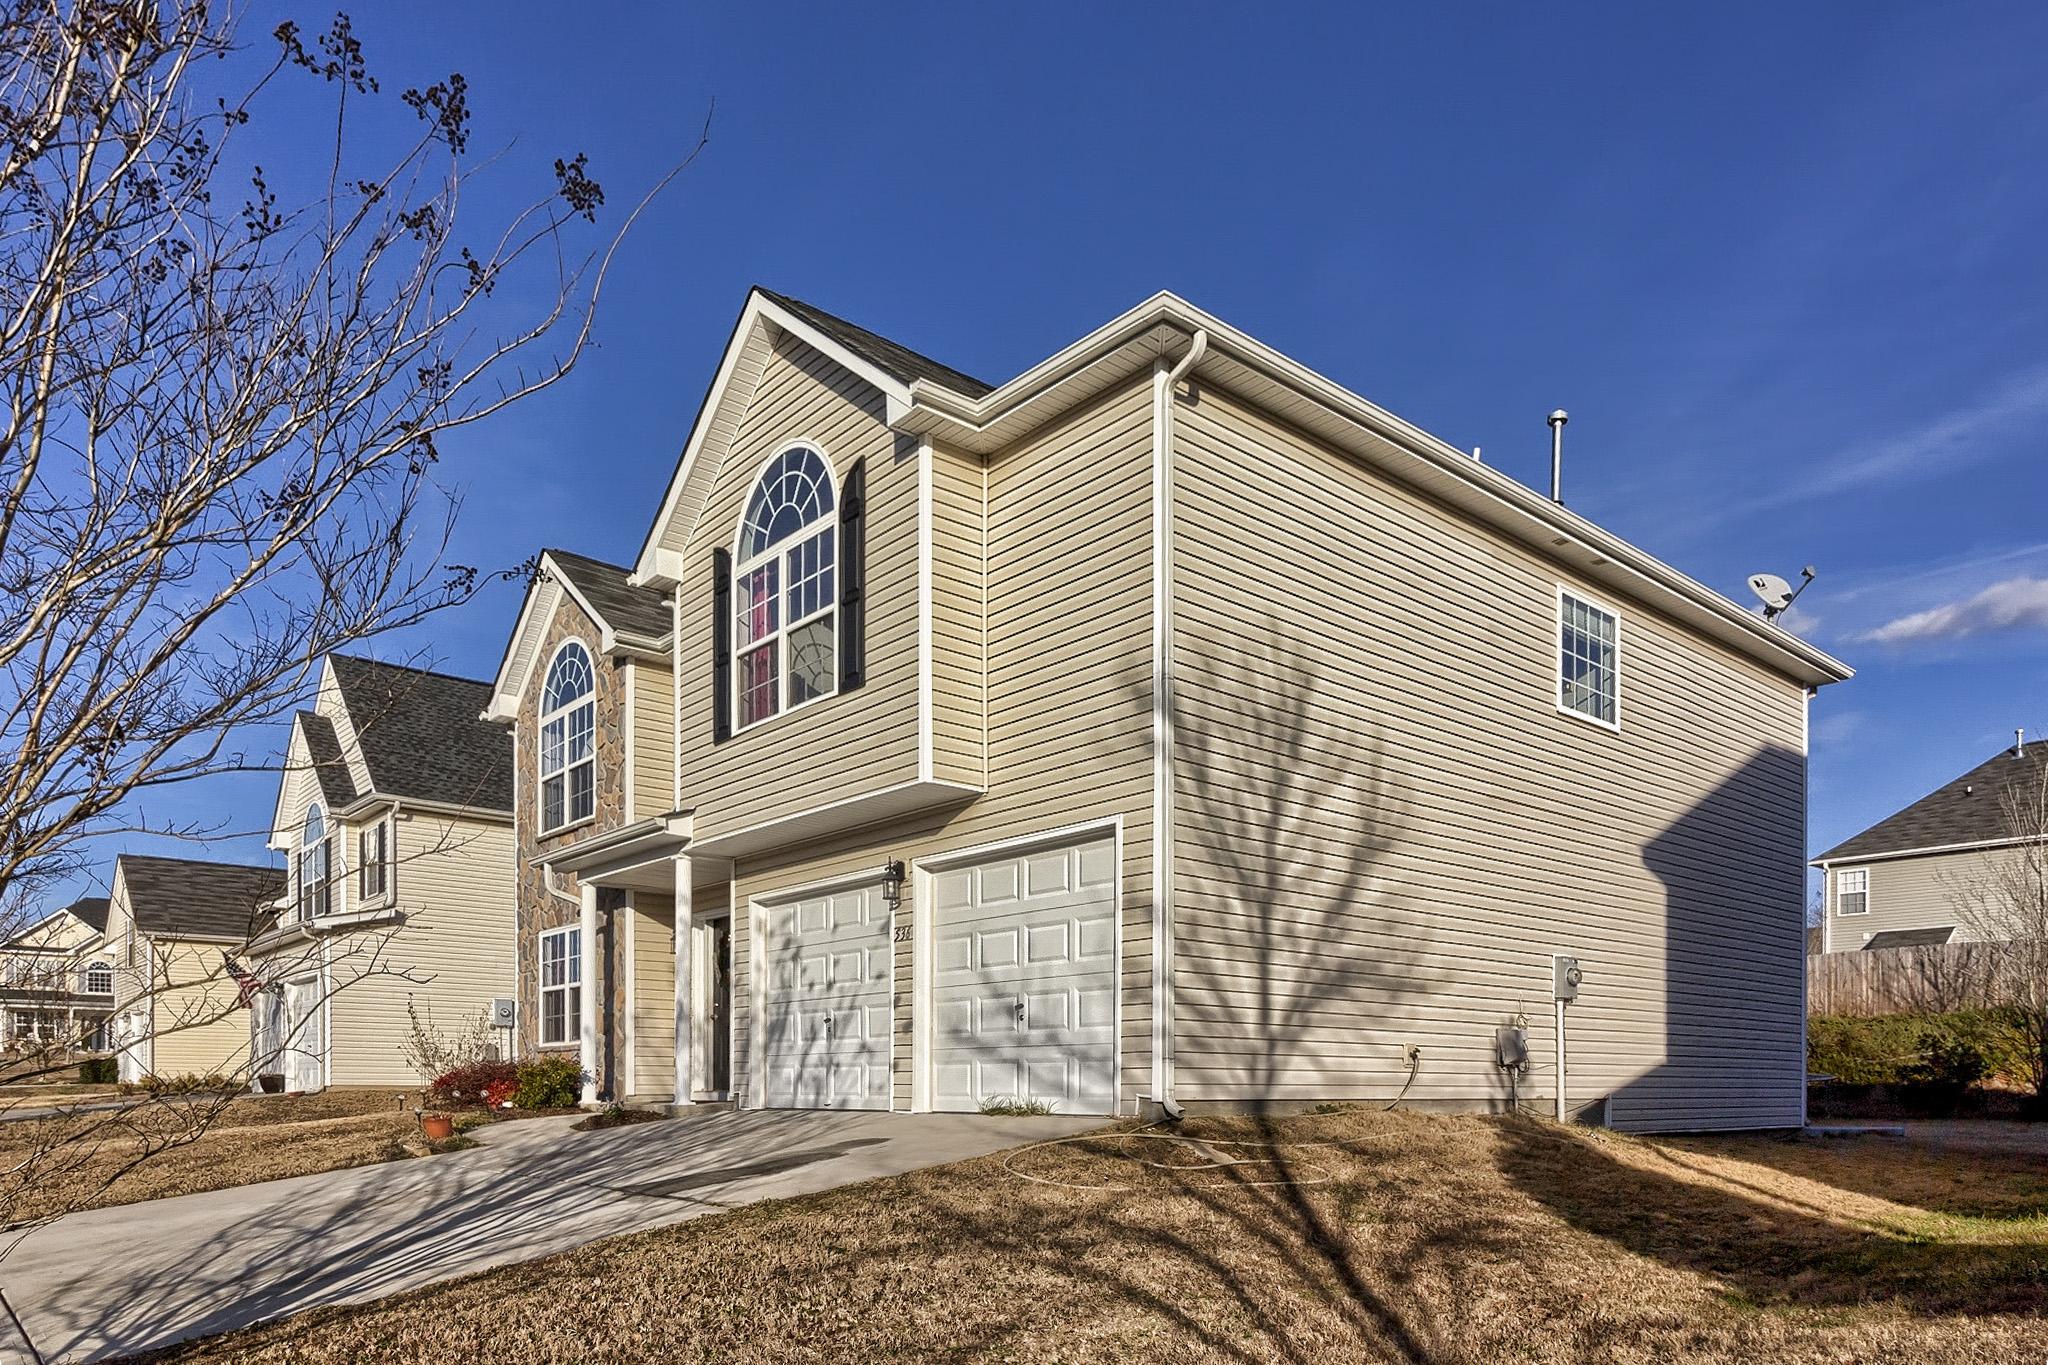 Roof Design Ideas: 536 Cool Creek Drive Rock Hill, SC 29732